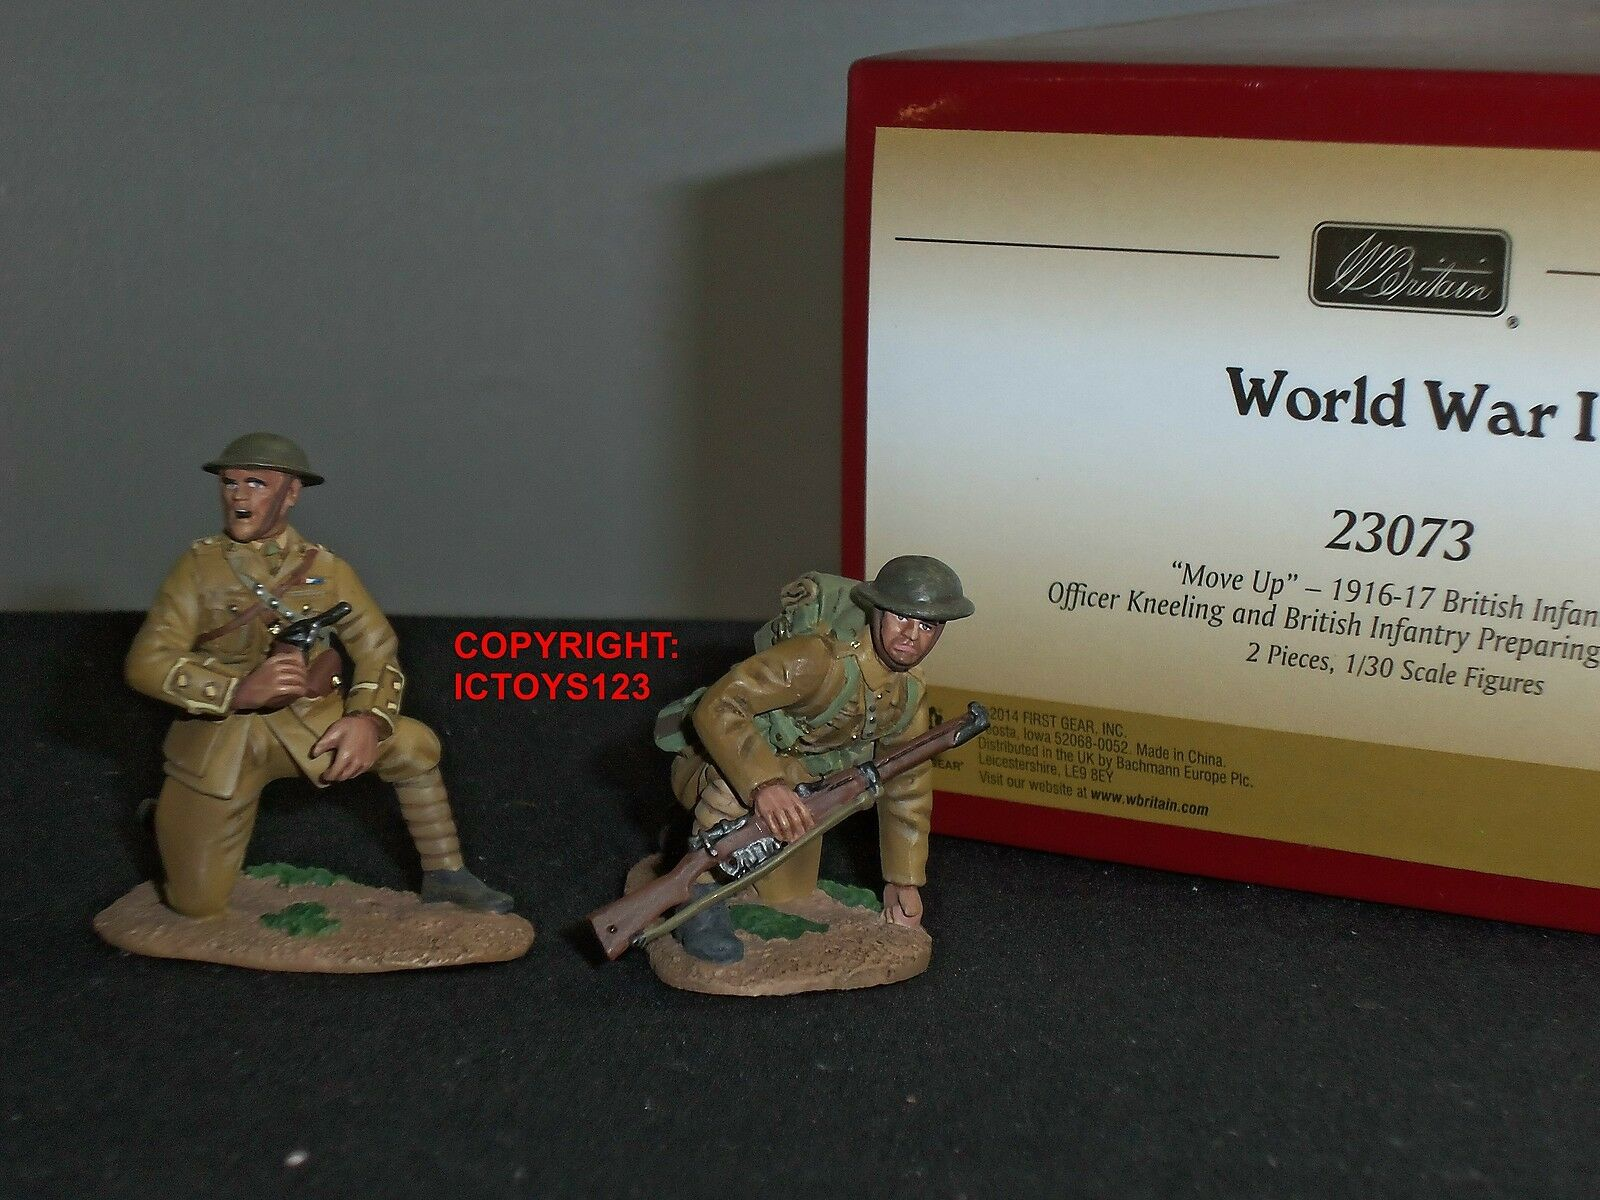 BRITAINS 23073 WORLD WAR ONE MOVE UP BRITISH INFANTRY + OFFICER TOY SOLDIER SET